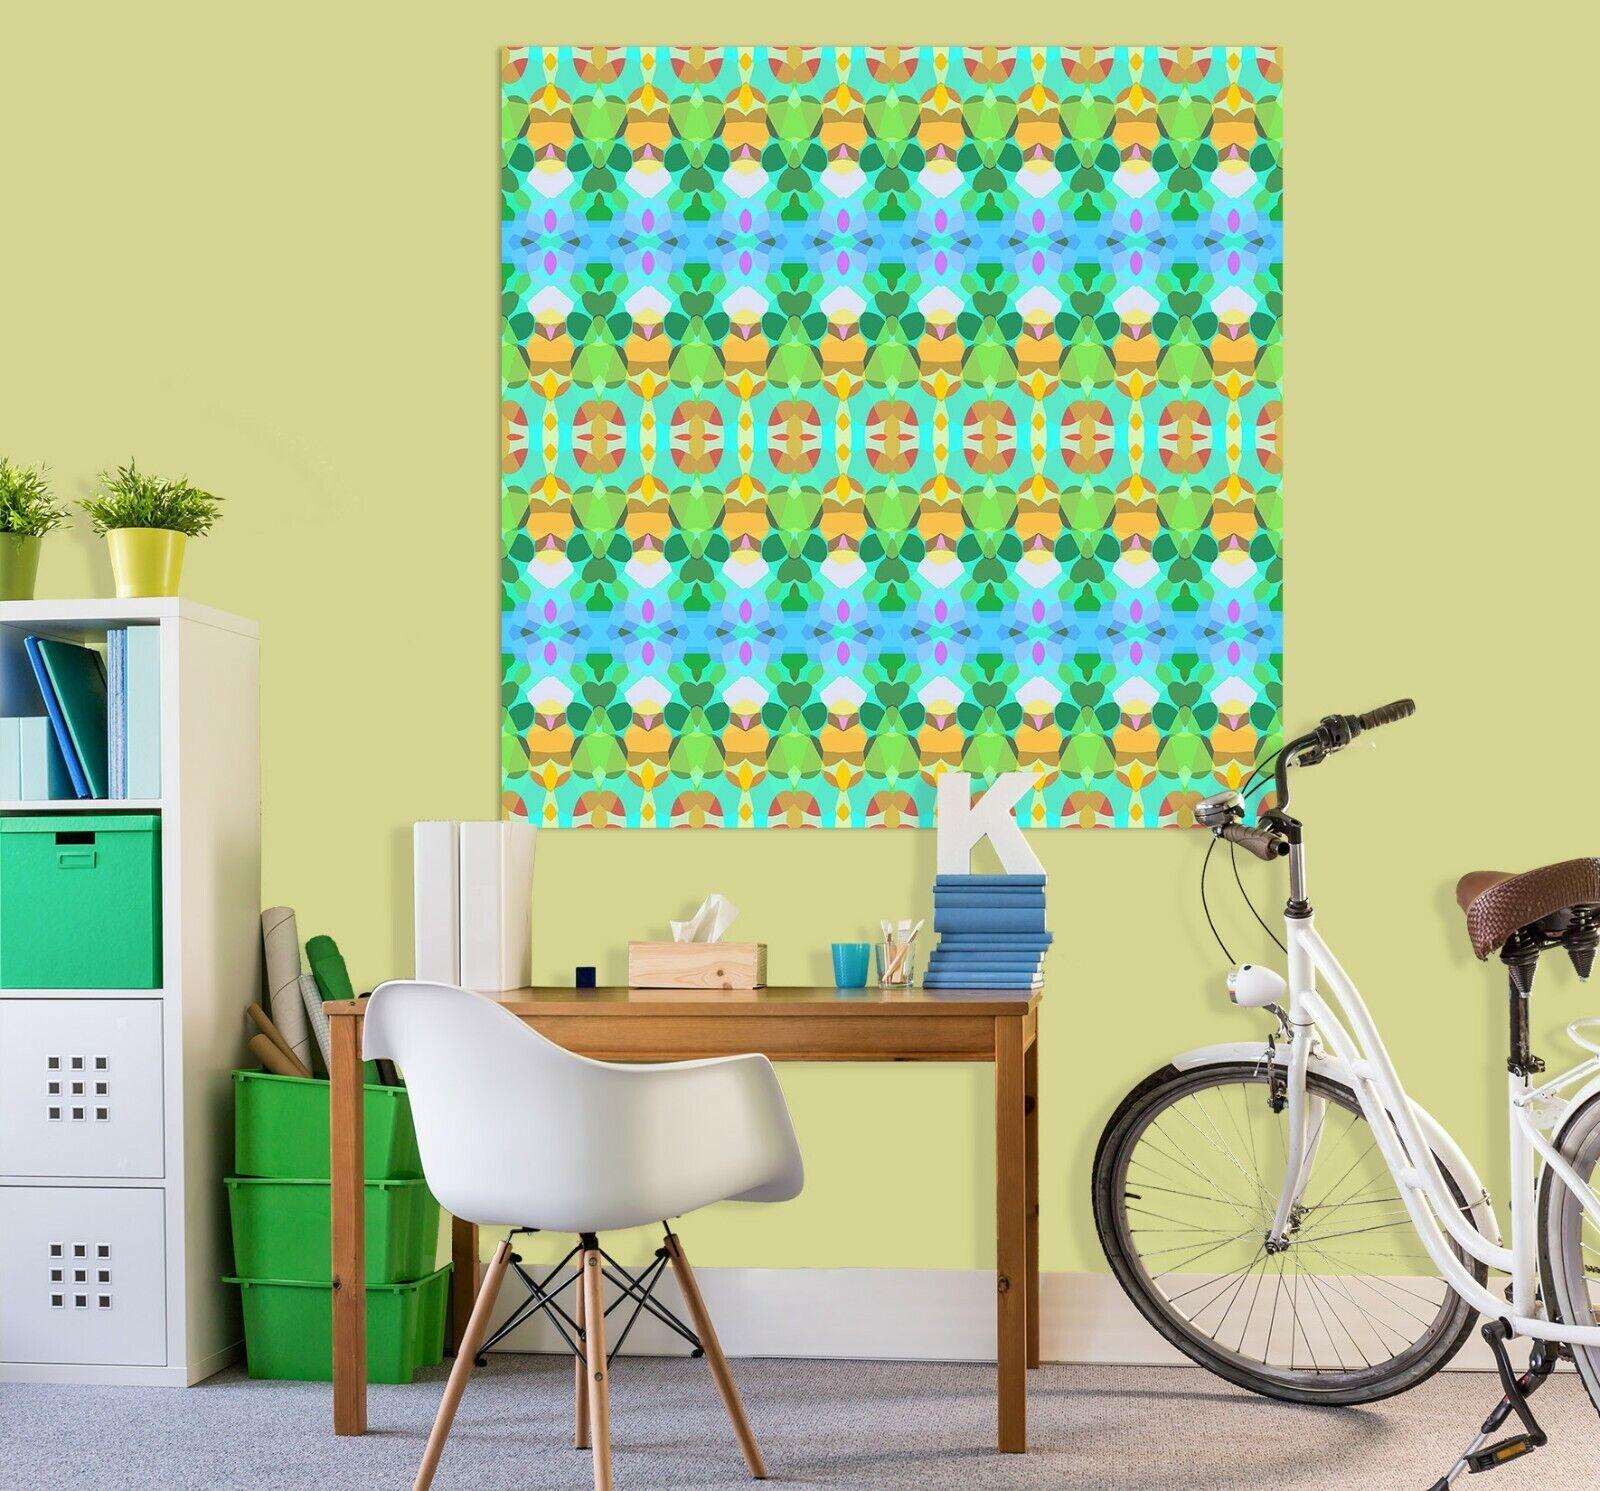 3D Grün Leaves ZHU413 Wall Stickers Wall Murals Wallpaper Shandra Smith Amy